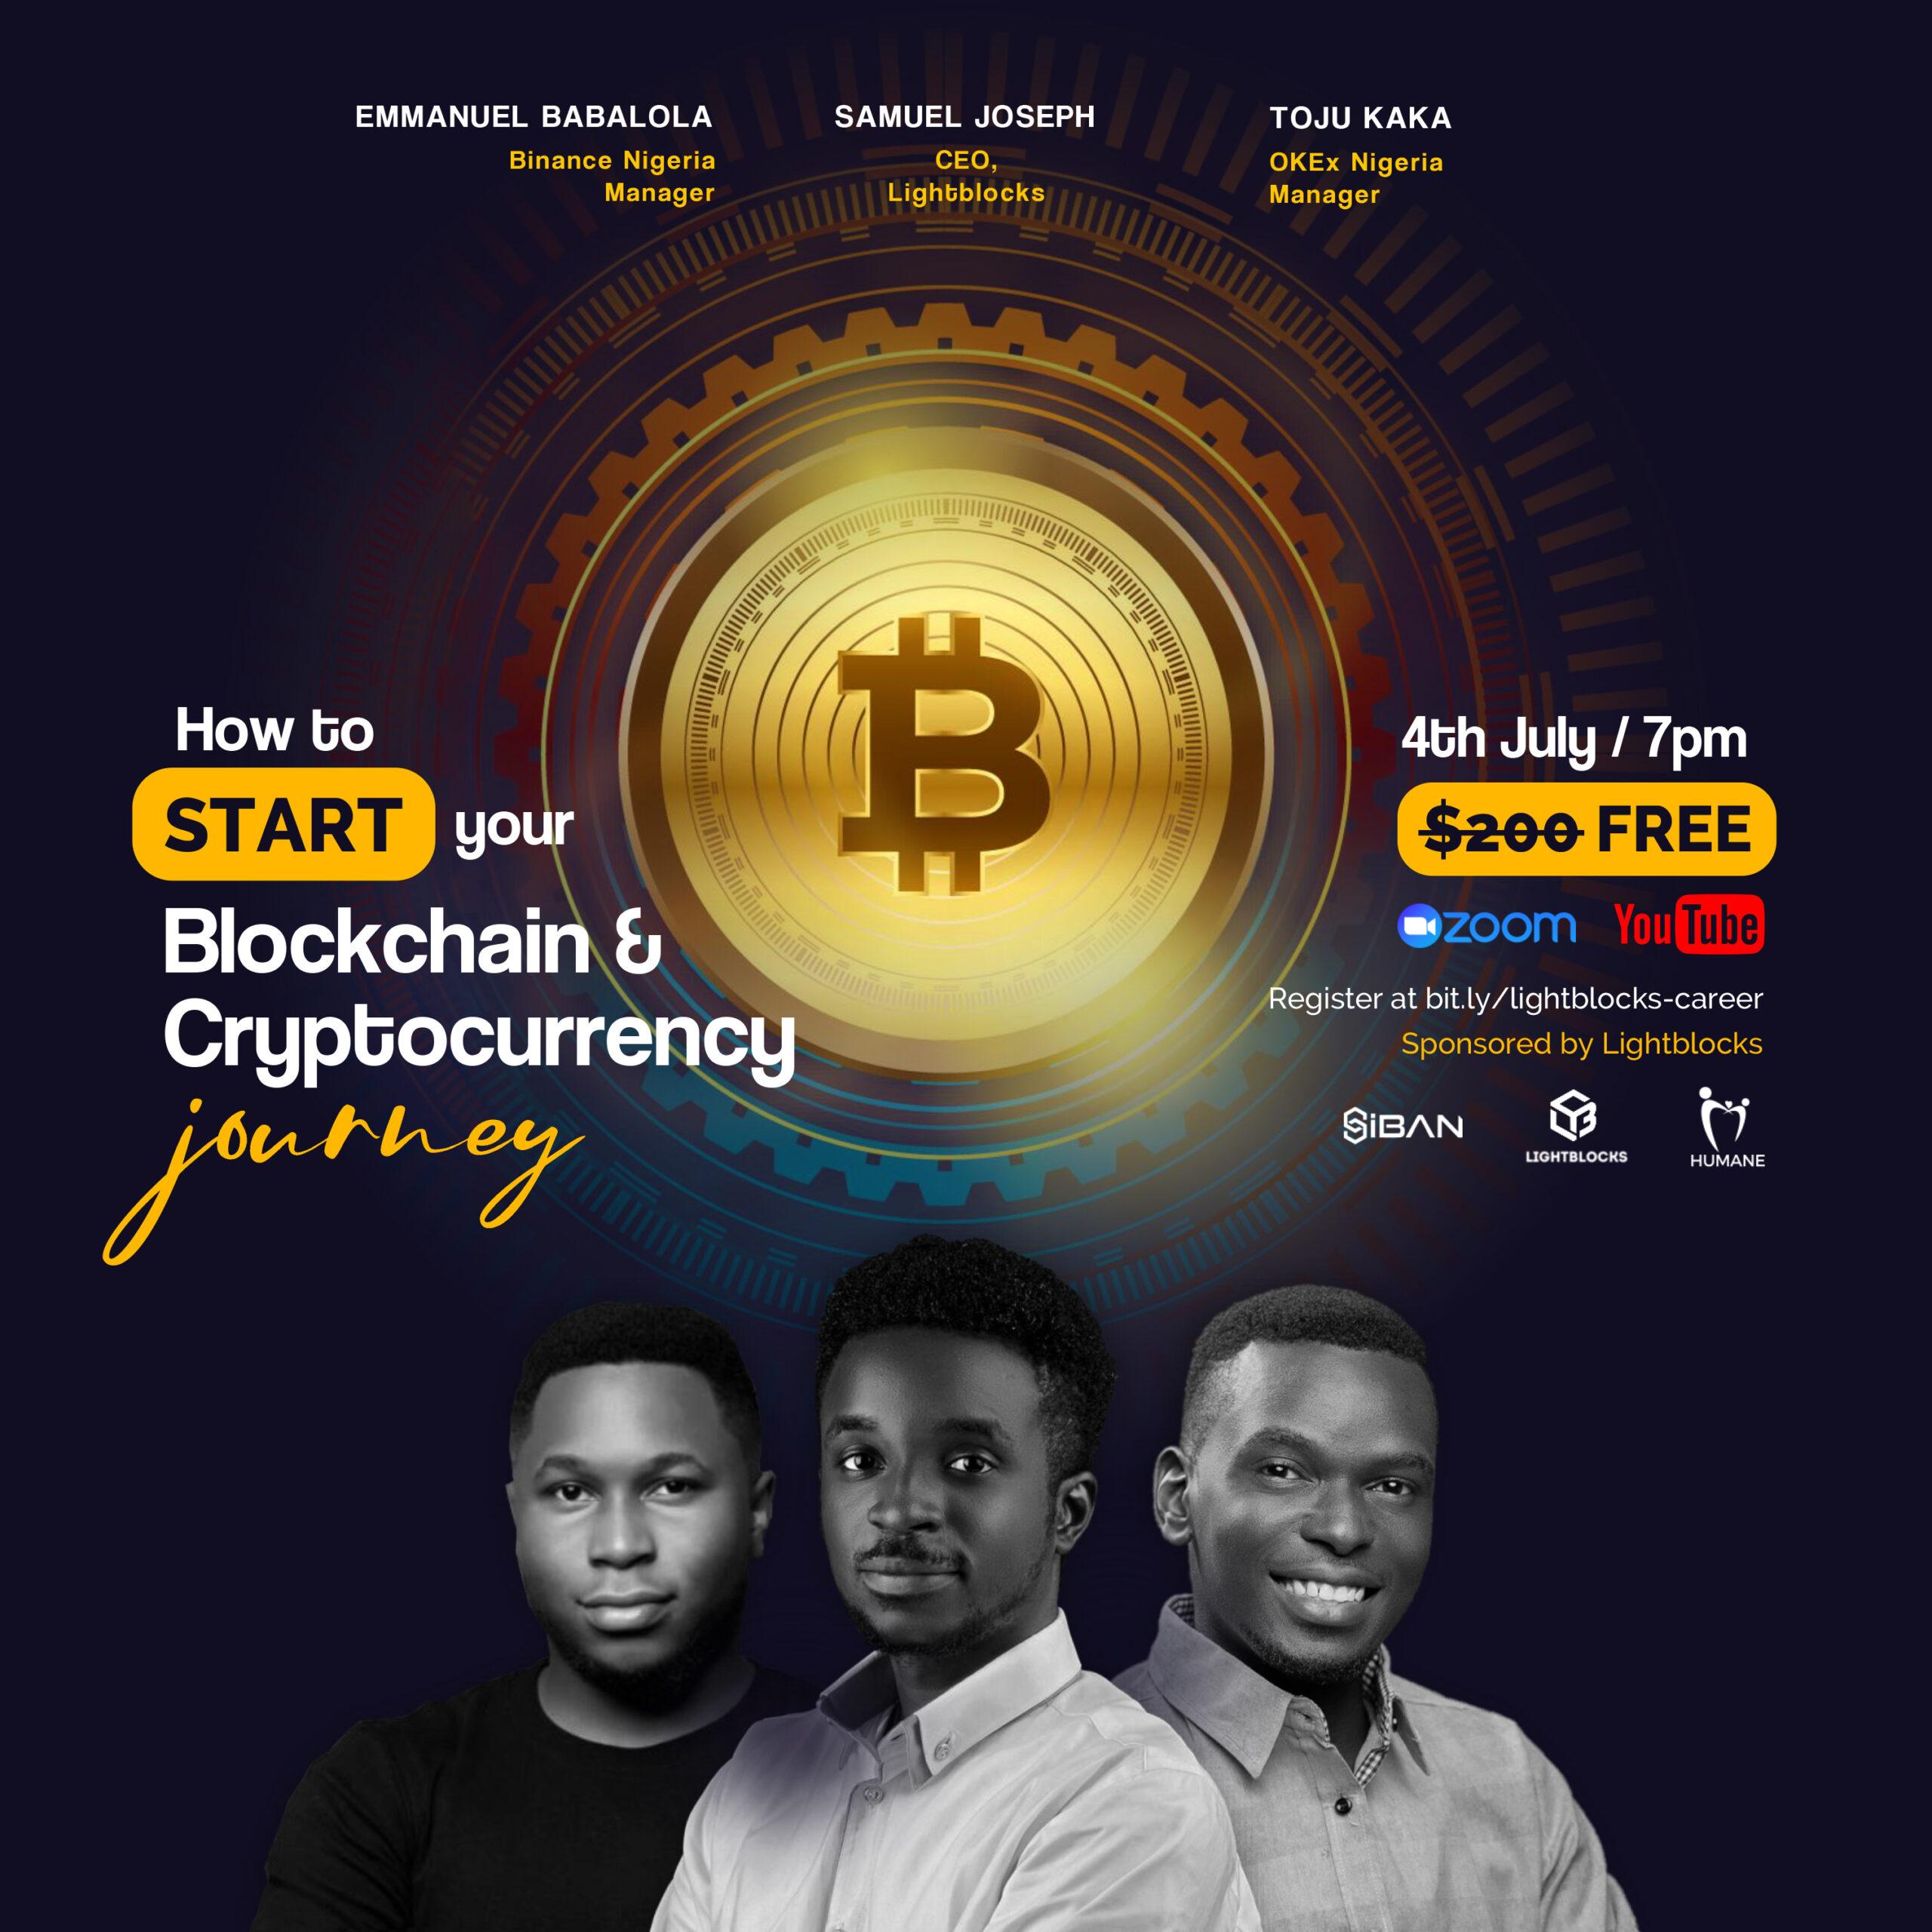 how to start your blockchain career with samuel joseph